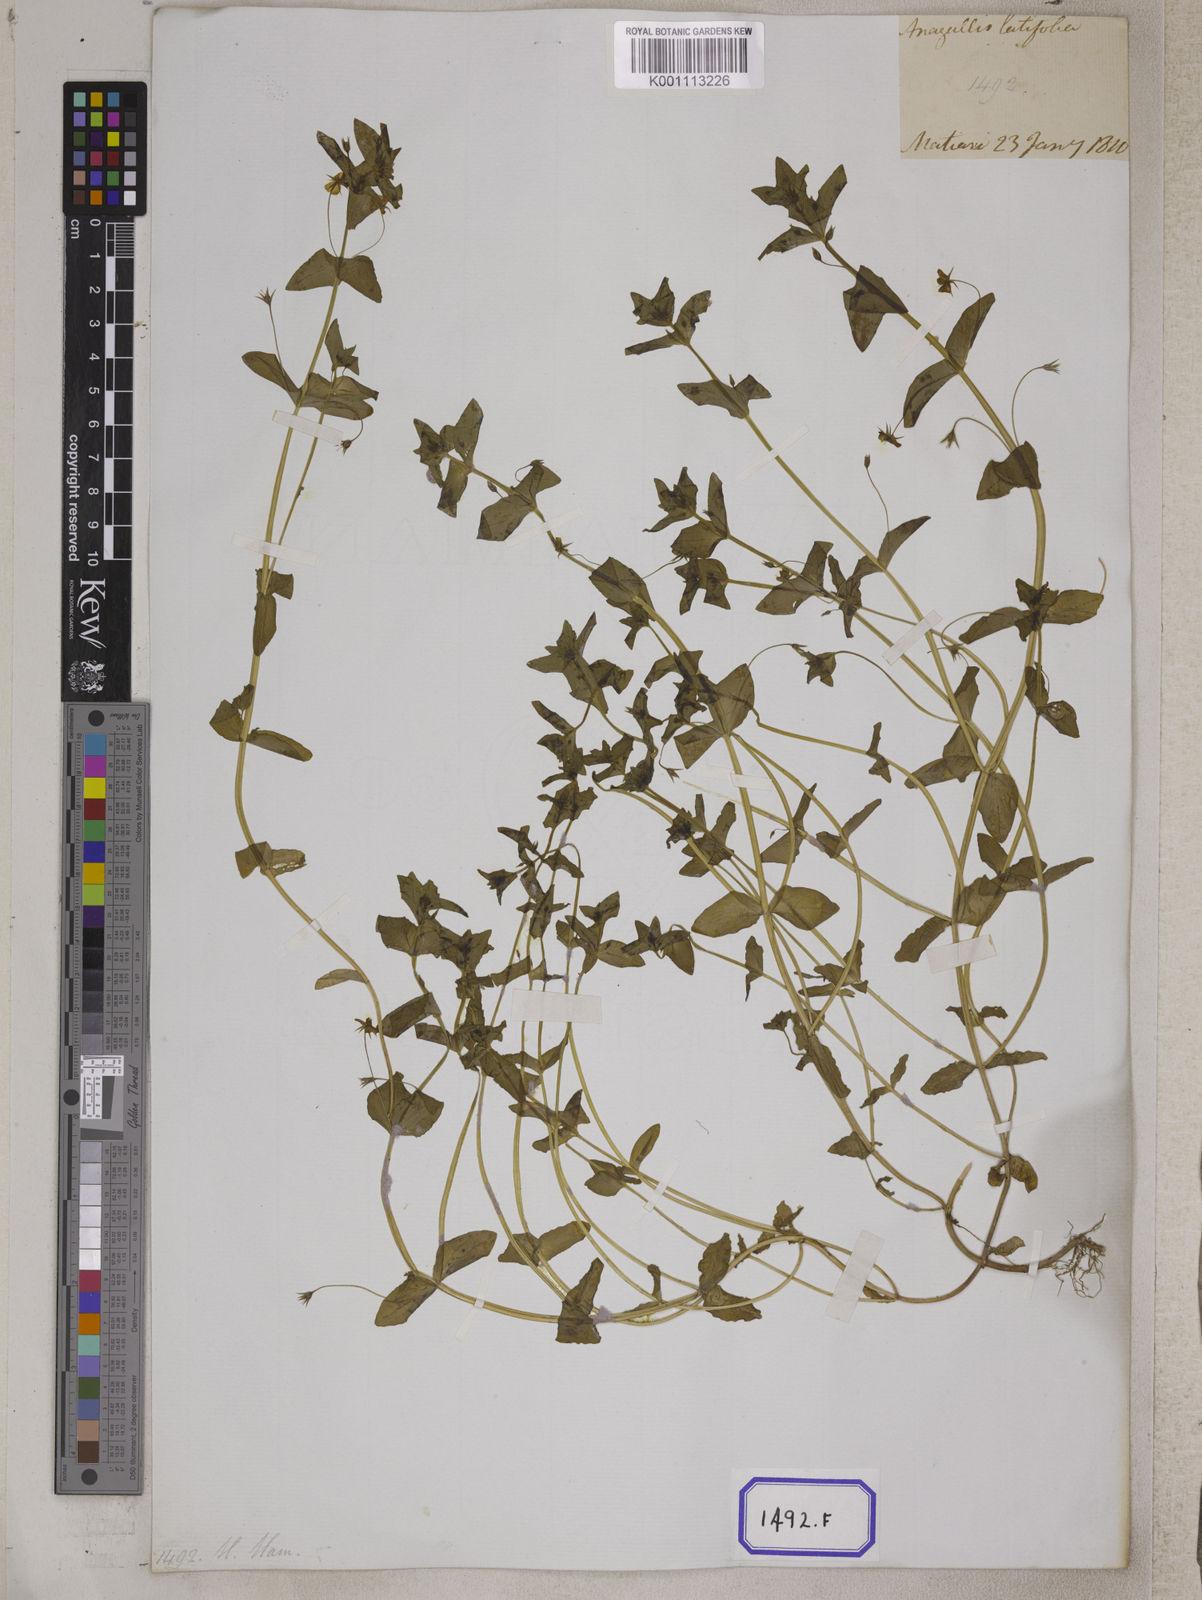 A specimen from Kew's Herbarium - <a href='http://specimens.kew.org/herbarium/K001113226' target='_blank' rel='nofollow'>K001113226</a><small><a href='/taxon/urn:lsid:ipni.org:names:329604-2'><em lang='la'>Anagallis arvensis</em></a> | Herbarium, RBG Kew</small>